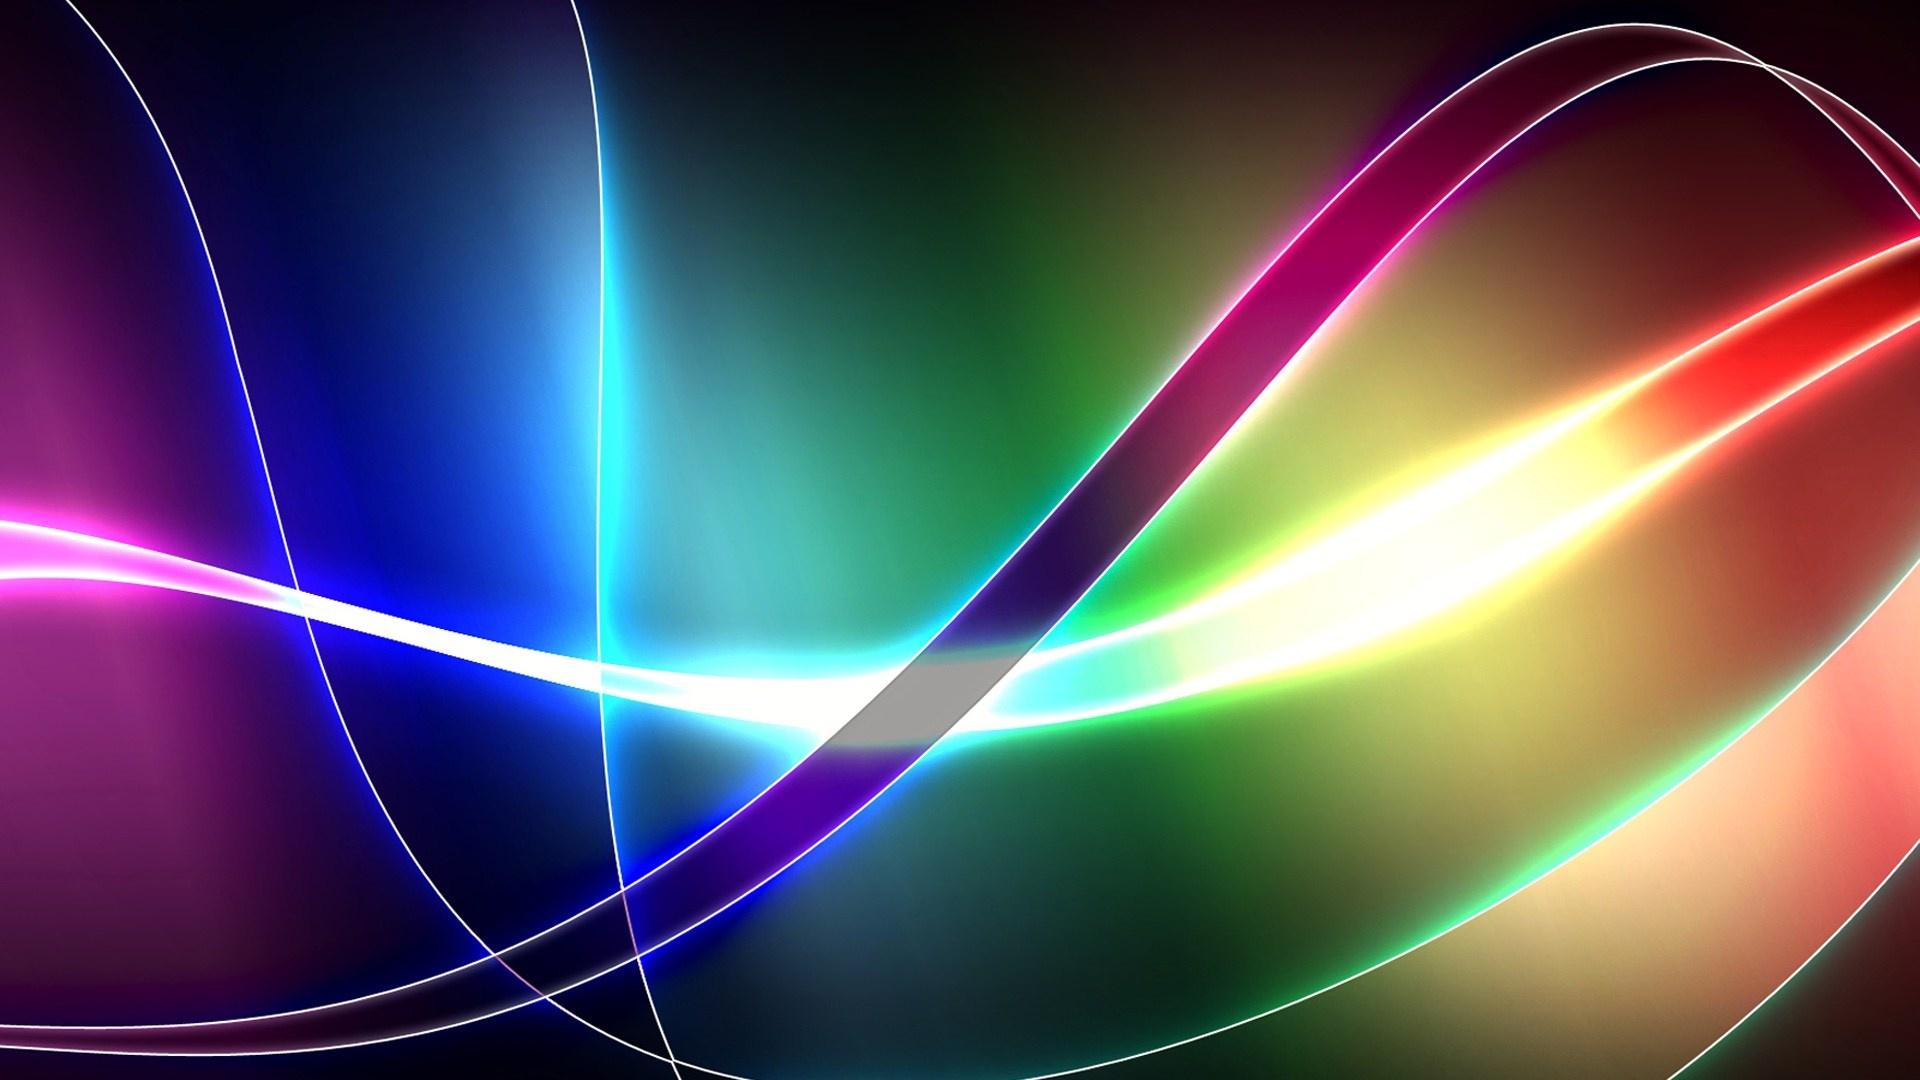 Ribbon Shine Full Colors - Ribbon Shine Full Colors